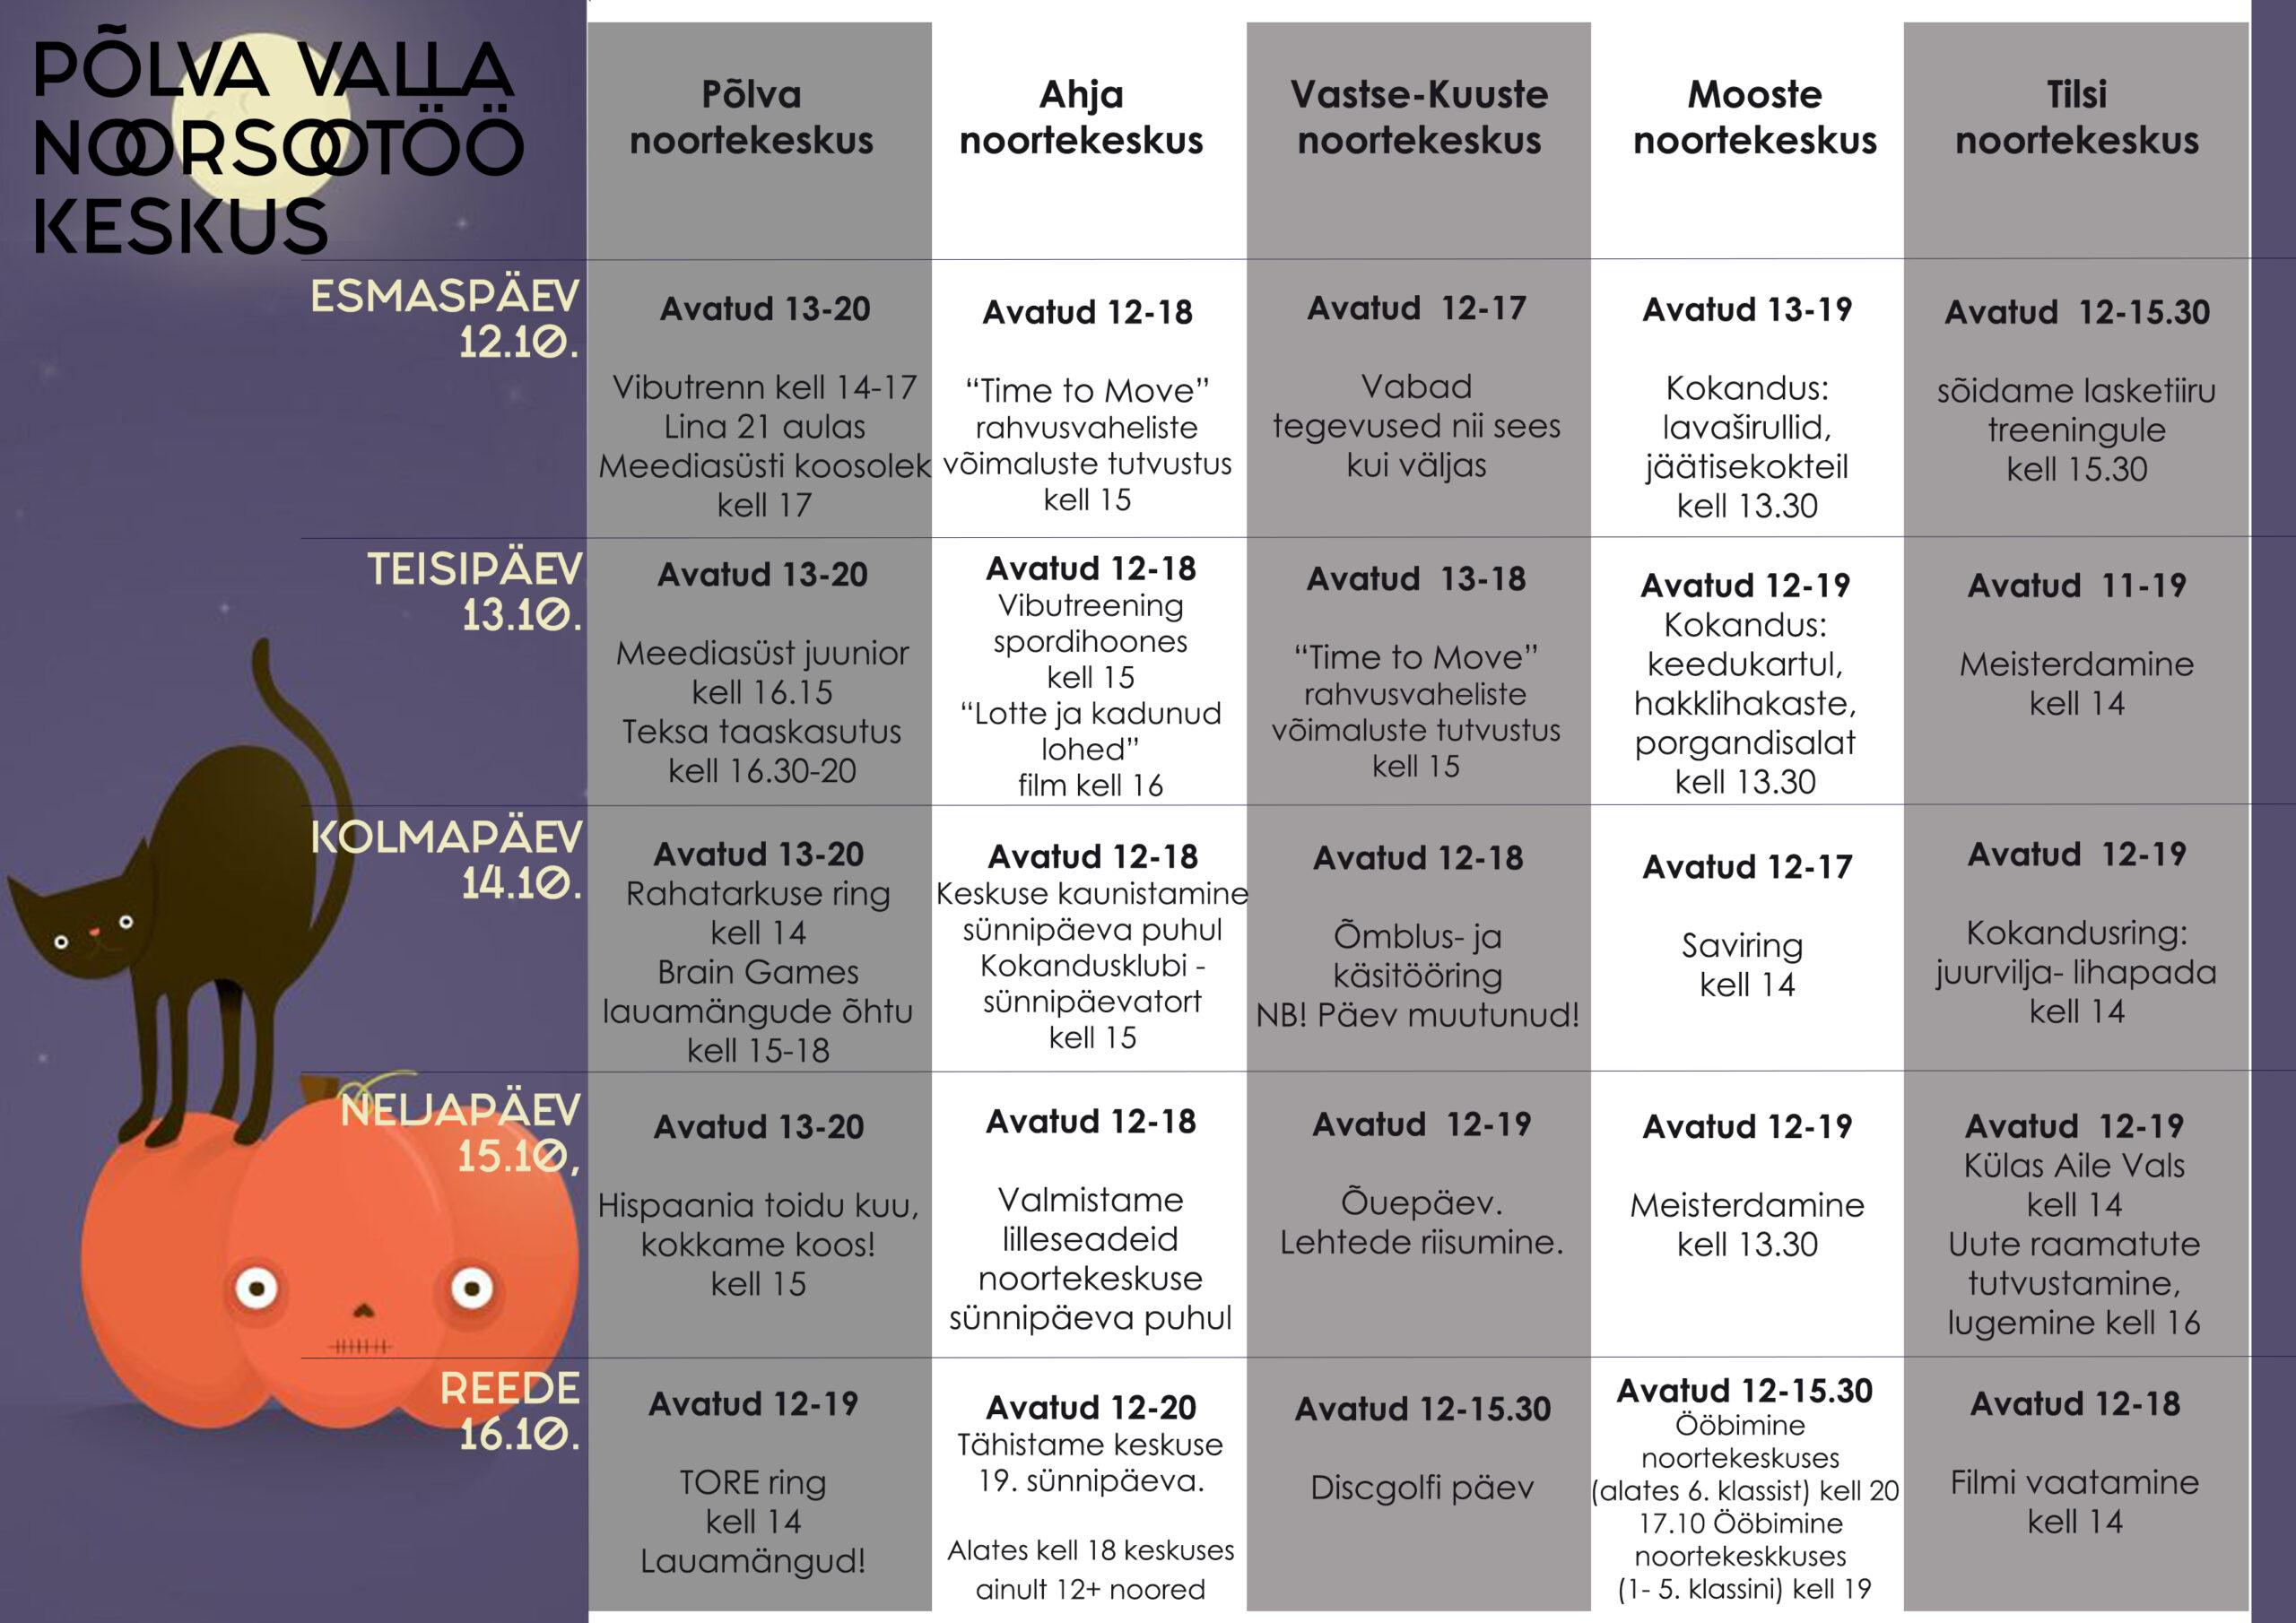 13.-16. oktoober Põlva valla noortekeskustes